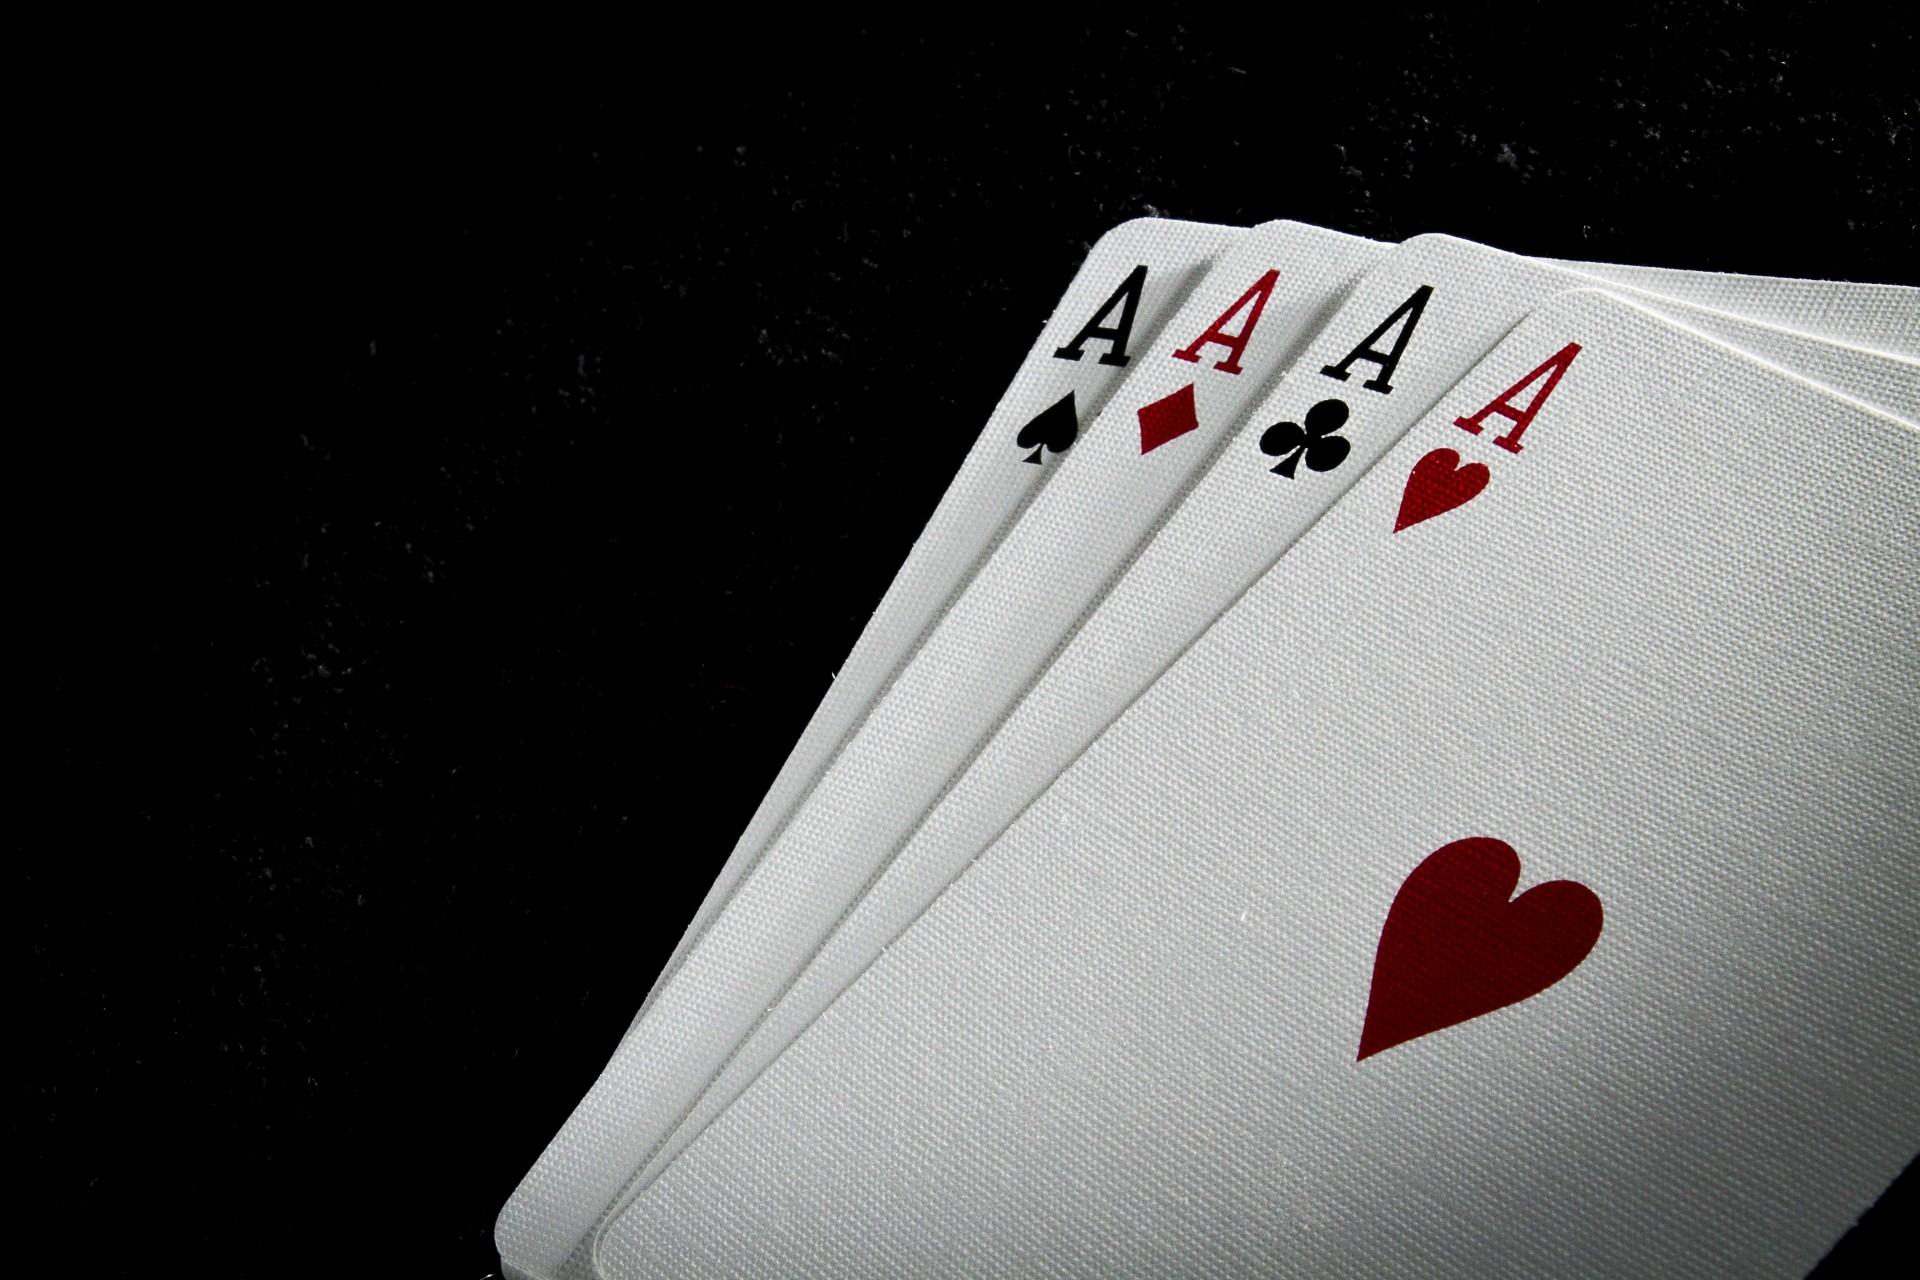 quatro-ases-de-baralho